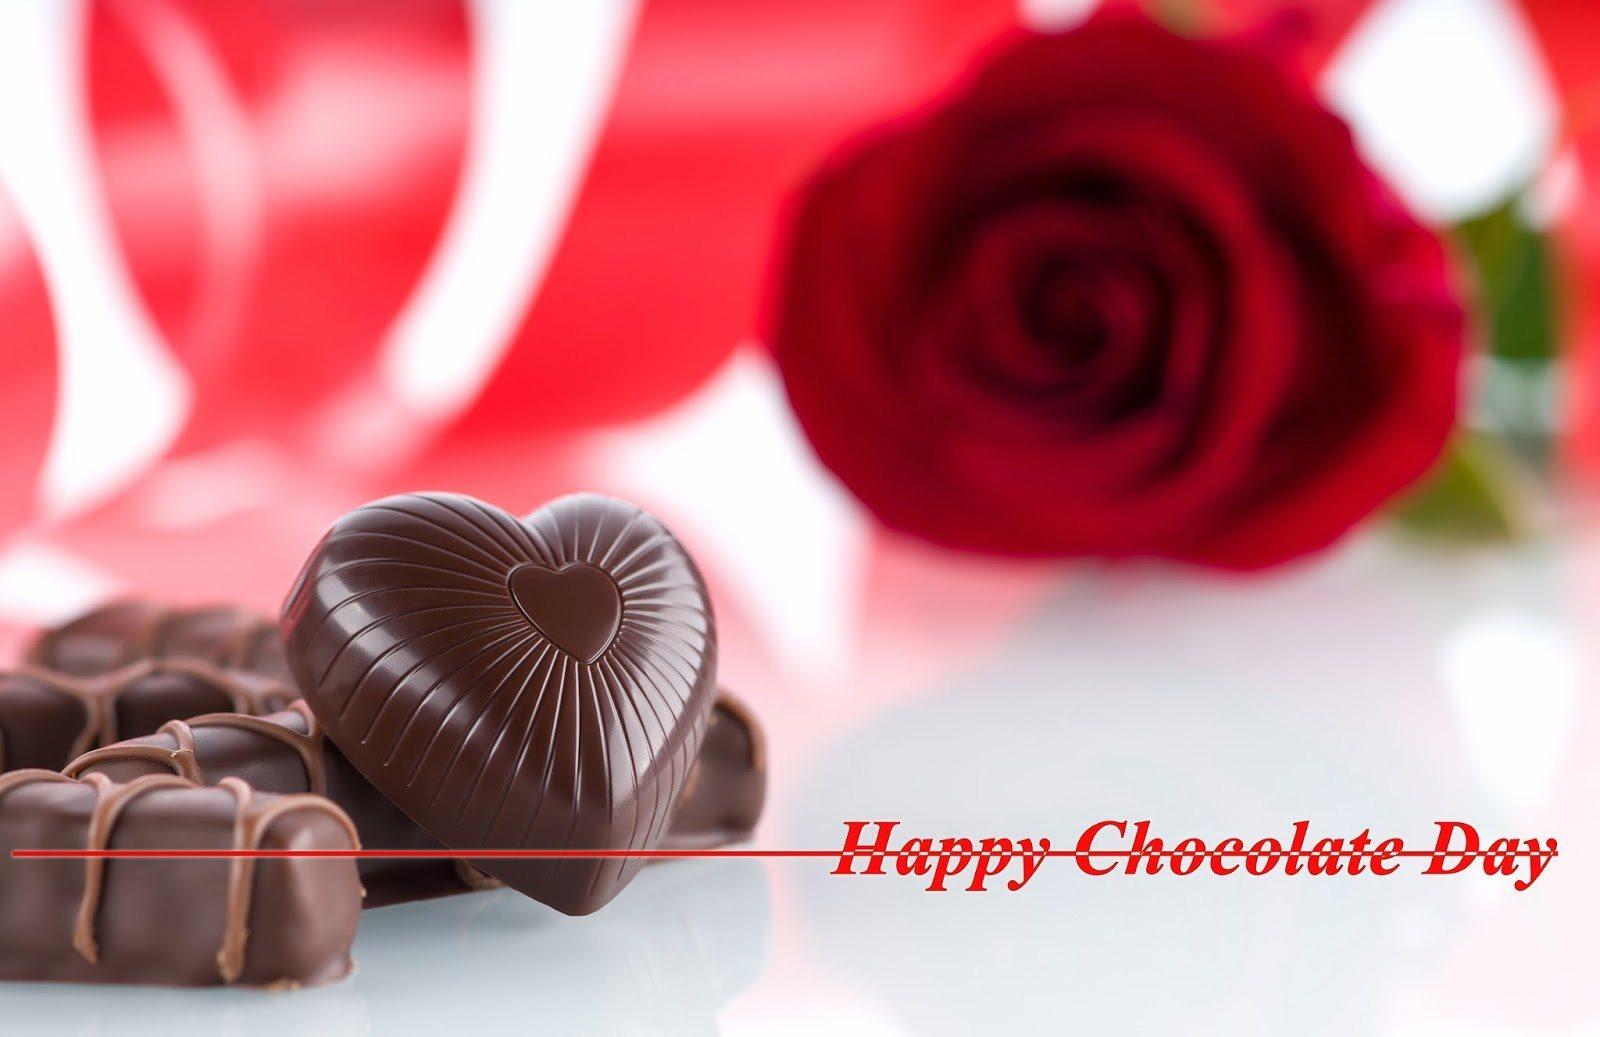 happy chocolate day wishes for girlfriend boyfriend or wife husband